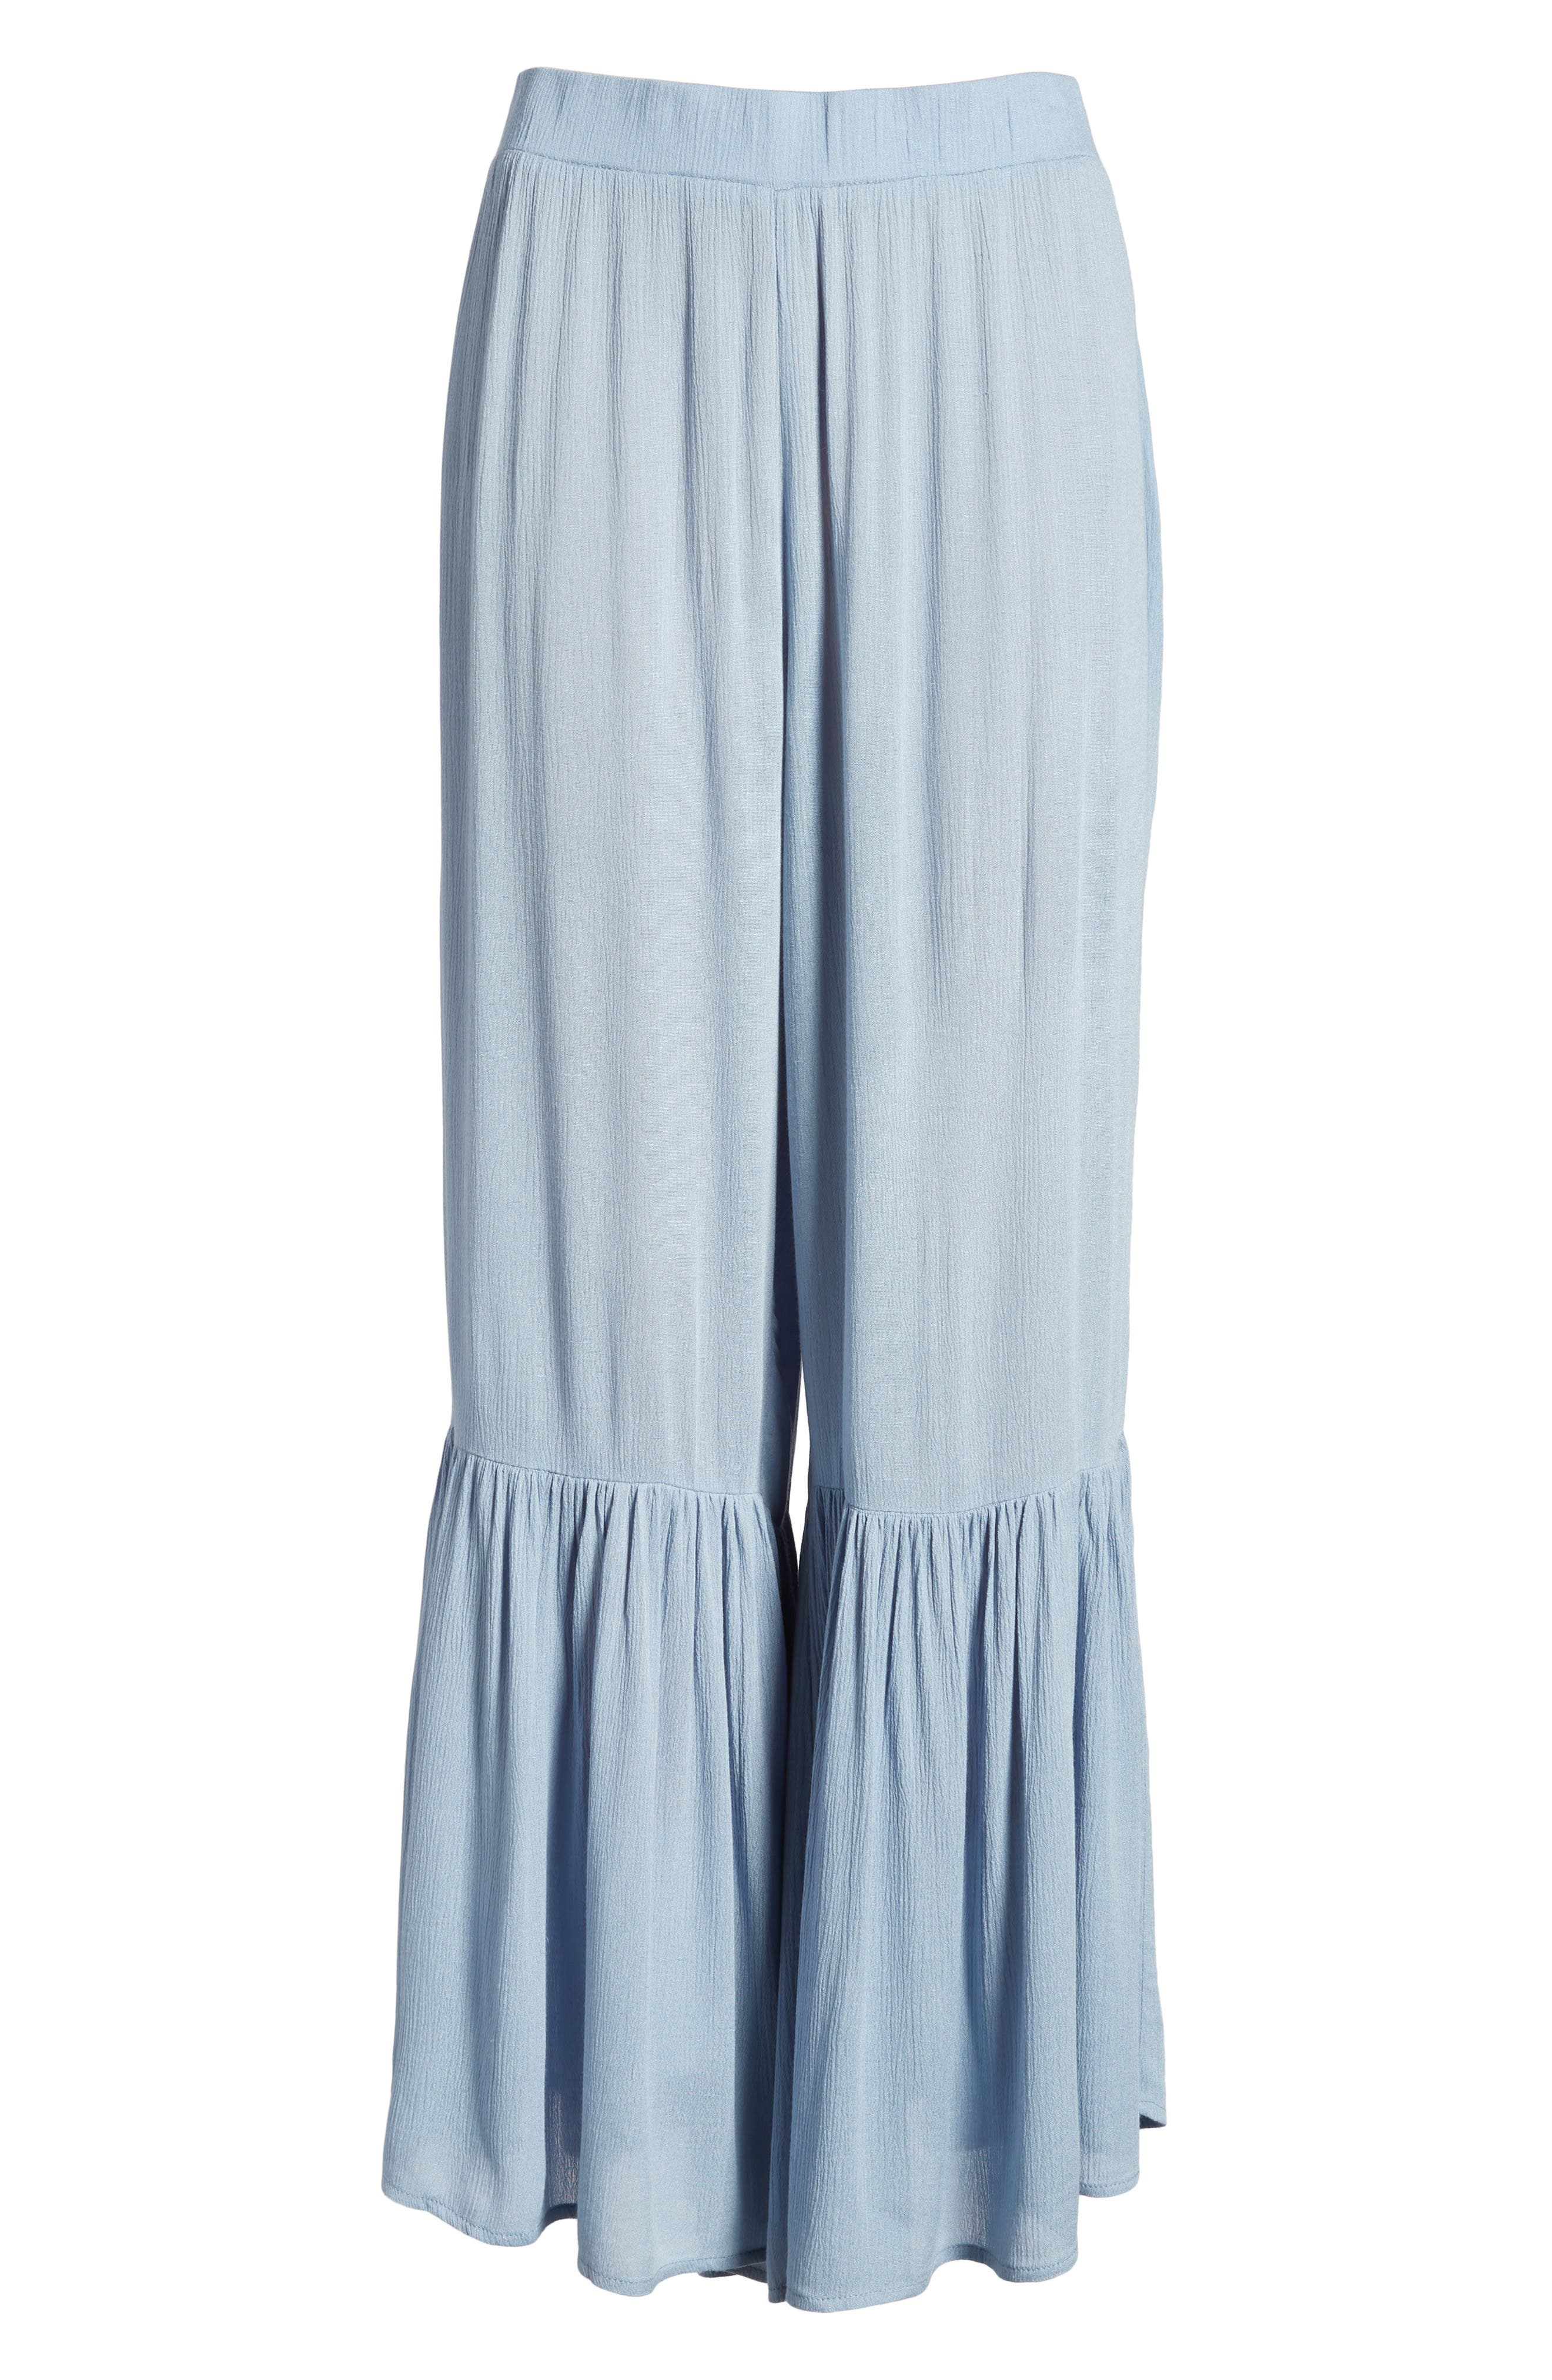 Mystique Ruffle Hem Beach Pants,                             Alternate thumbnail 8, color,                             Blue